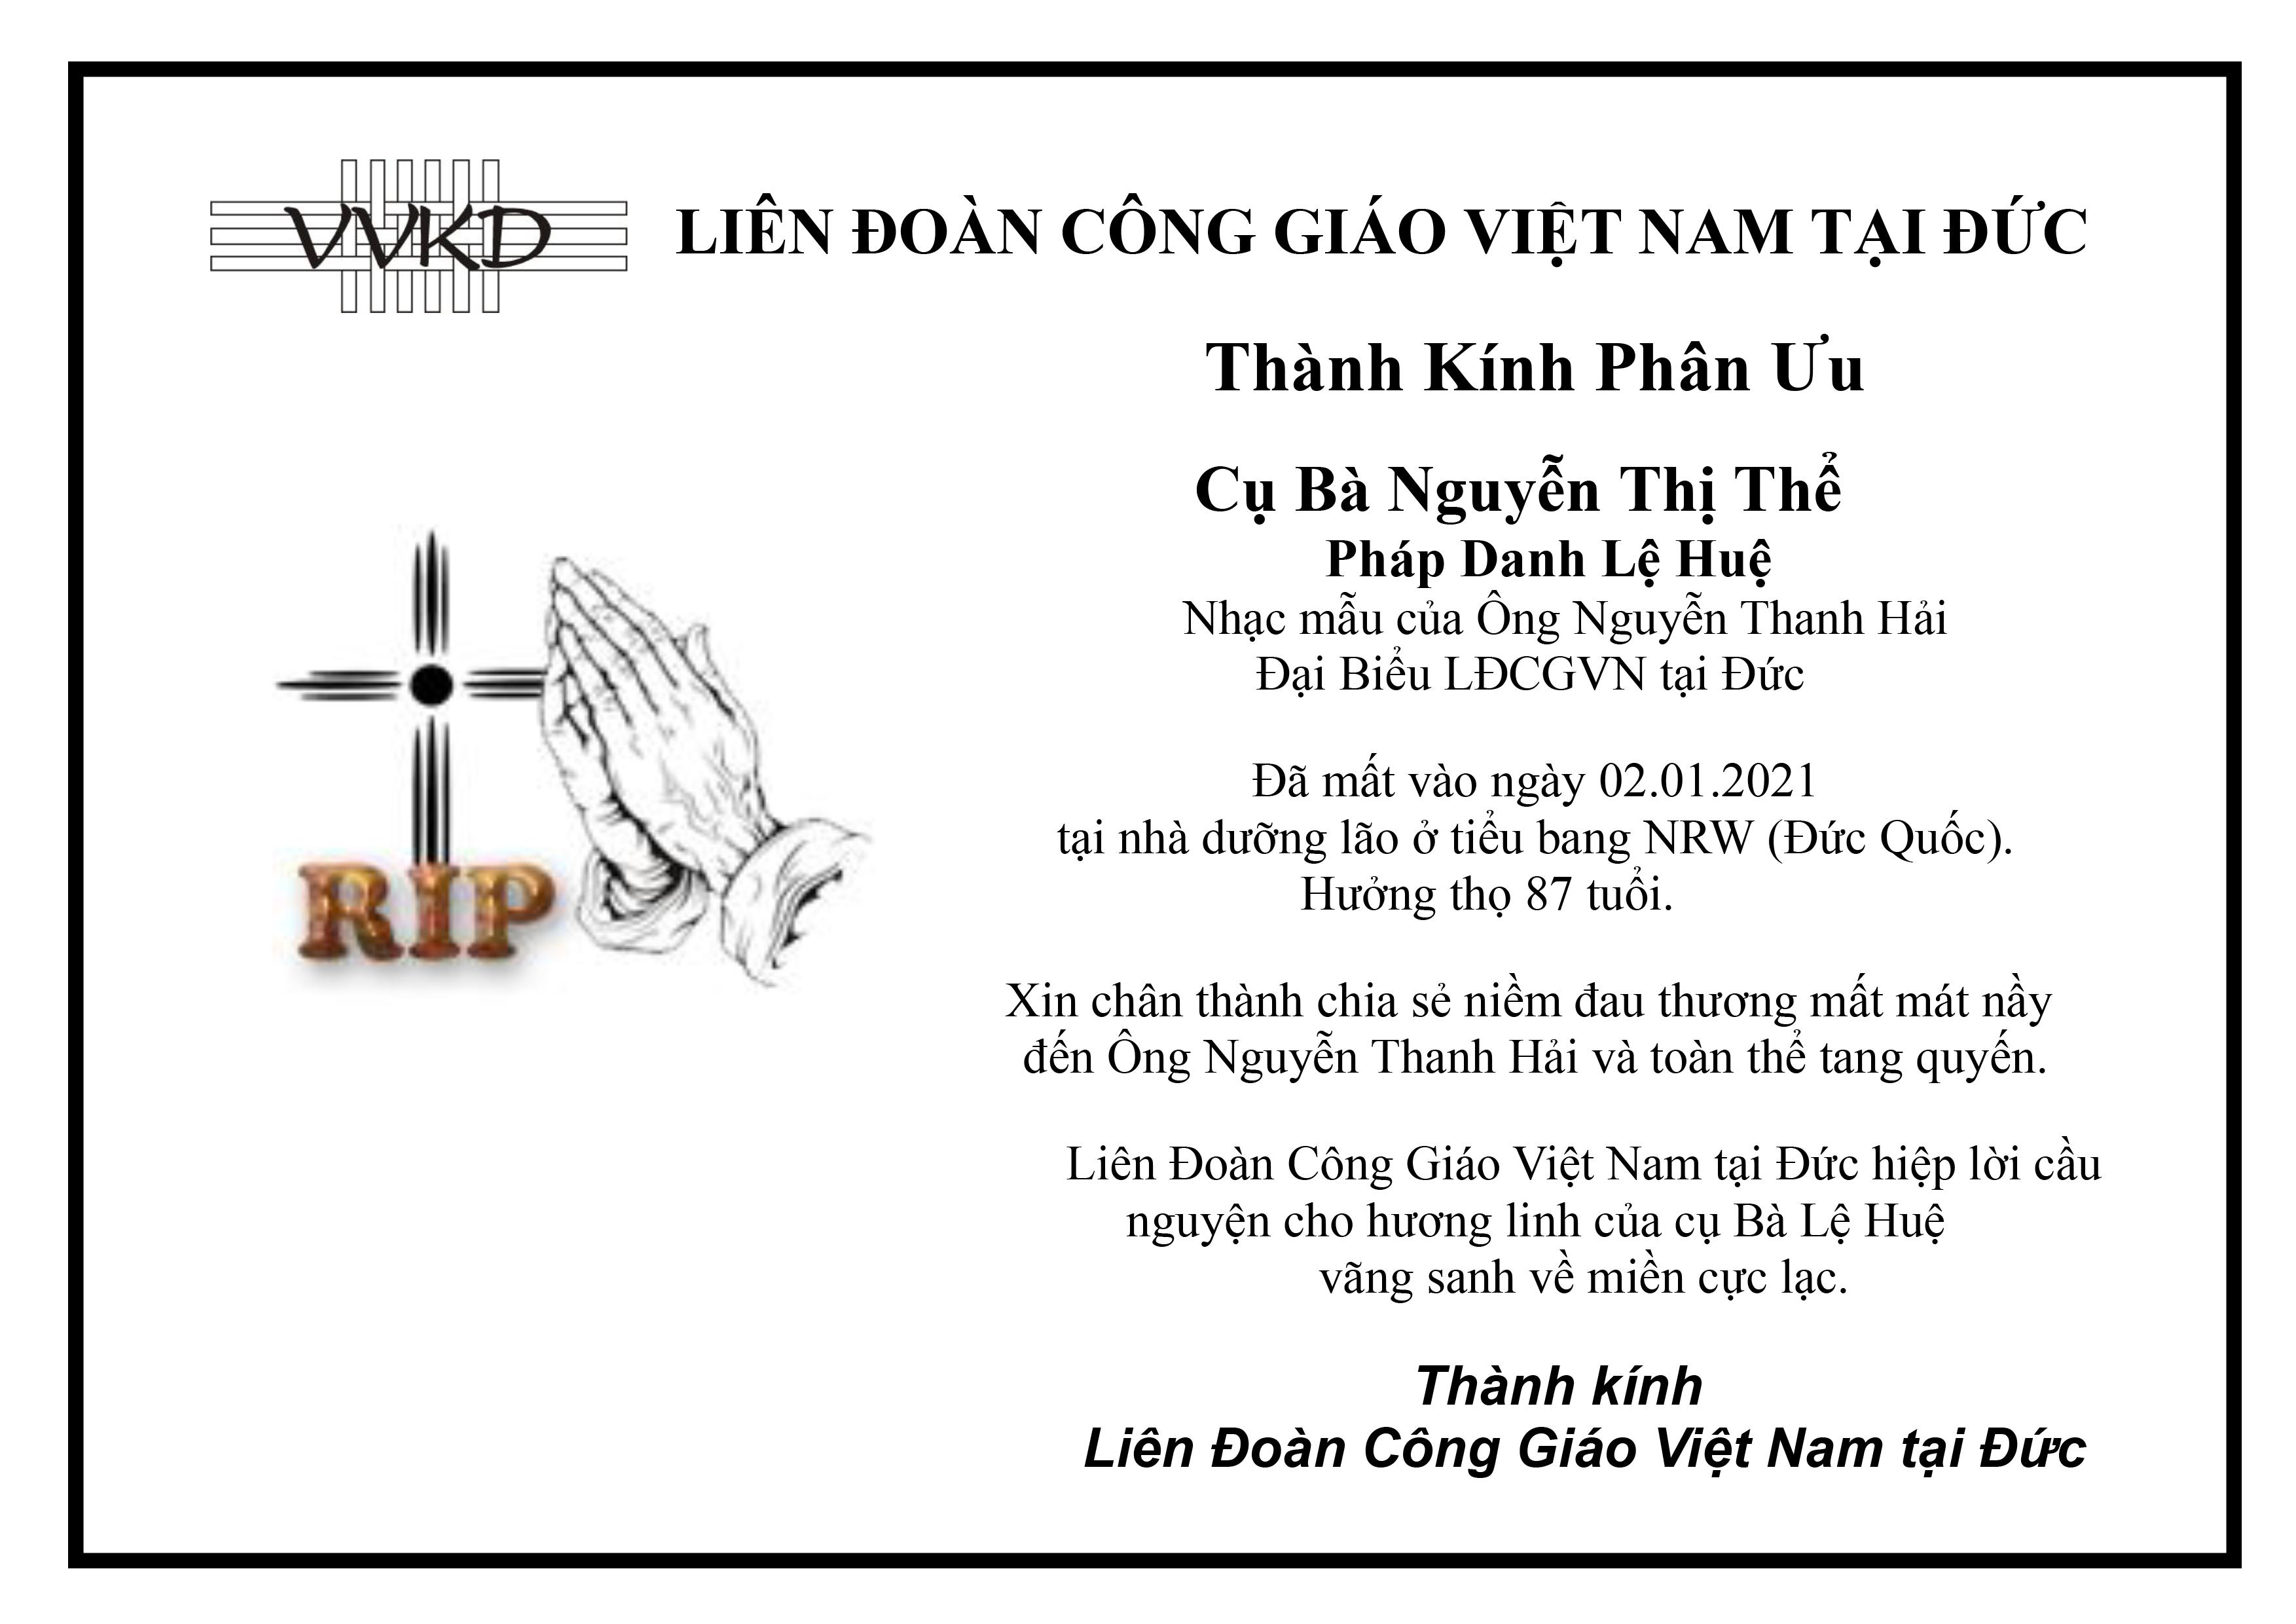 Cu Ba Nguyen Thi The